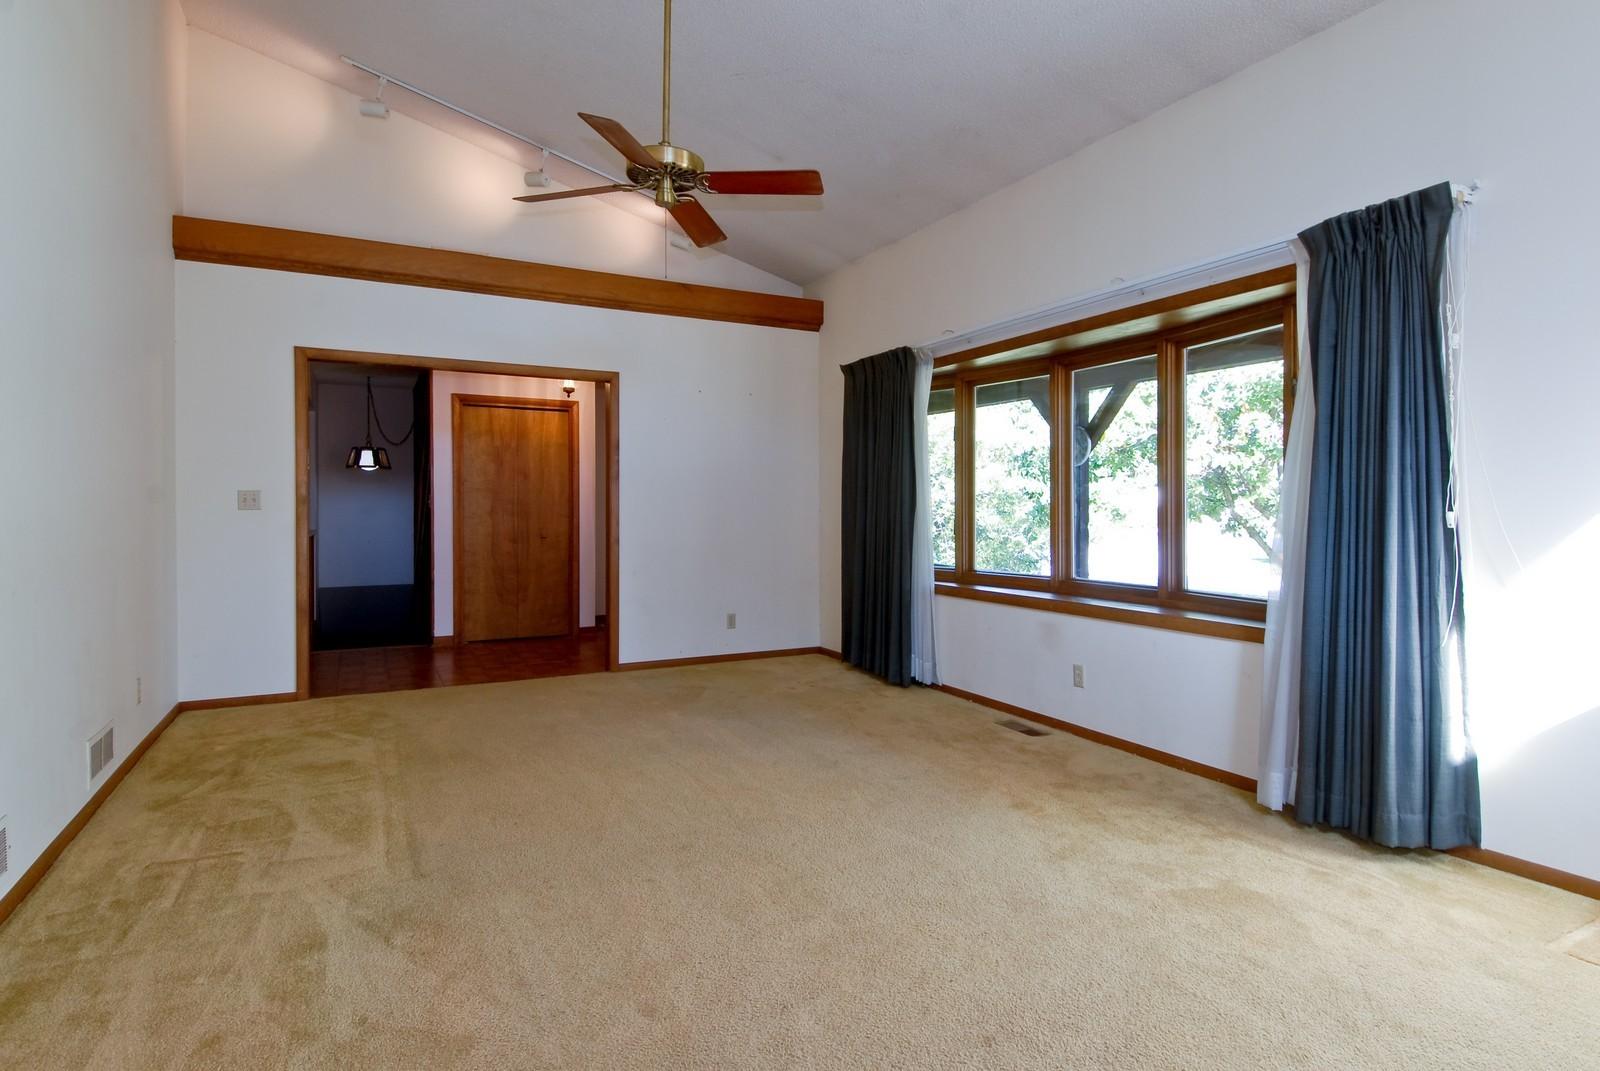 Real Estate Photography - 625 Konen Ave, Aurora, IL, 60505 - Living Room